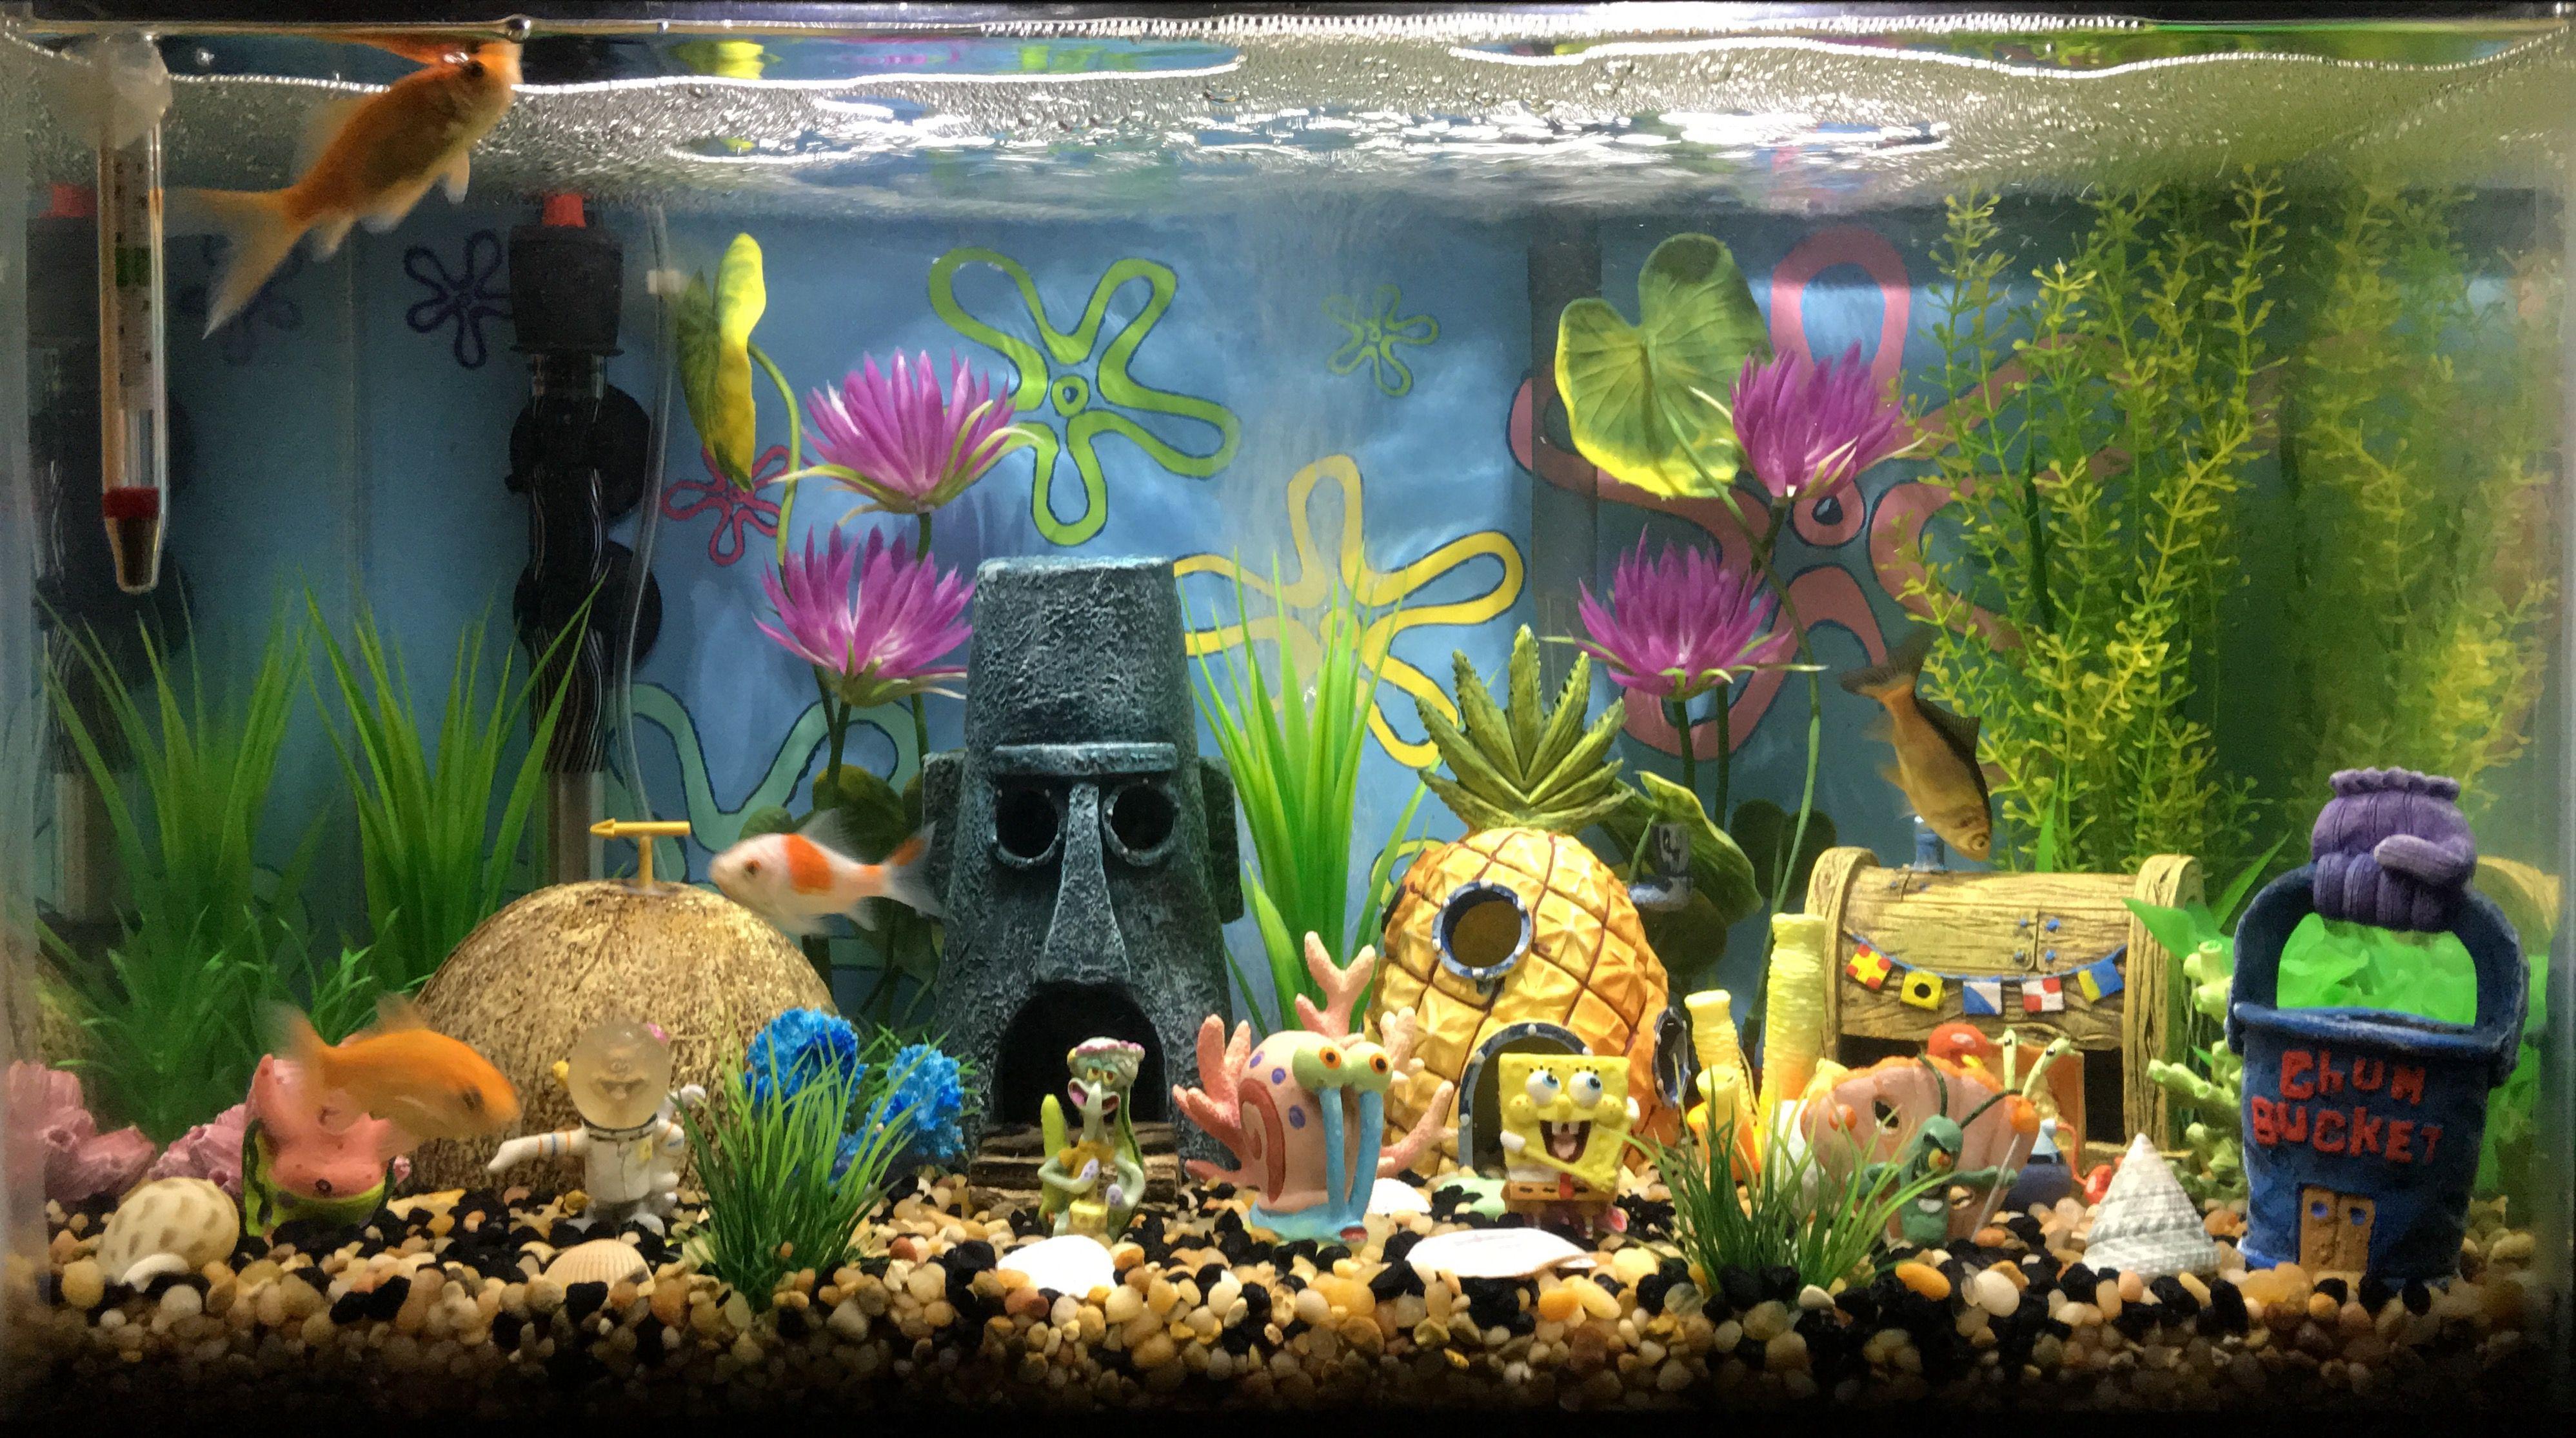 Best Spongebob Decoration For Fish Tanks Fish Tank Themes Fish Aquarium Decorations Fish Tank Decorations